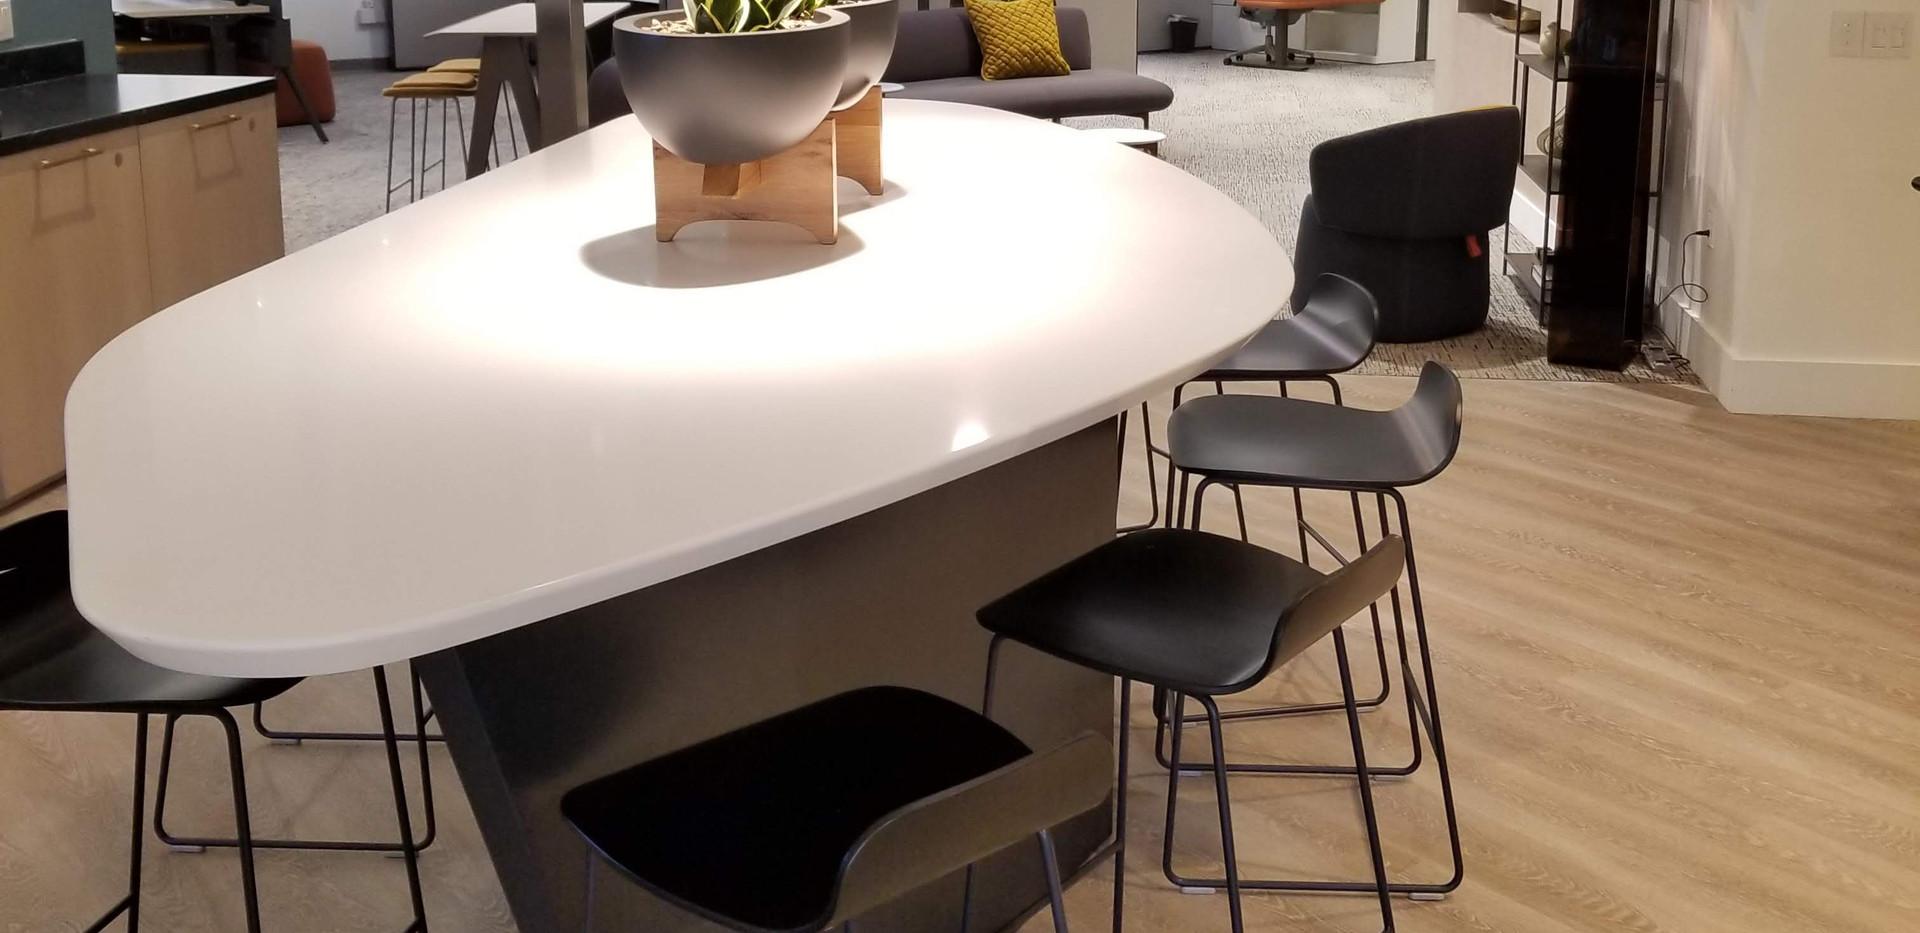 Hospitality Table